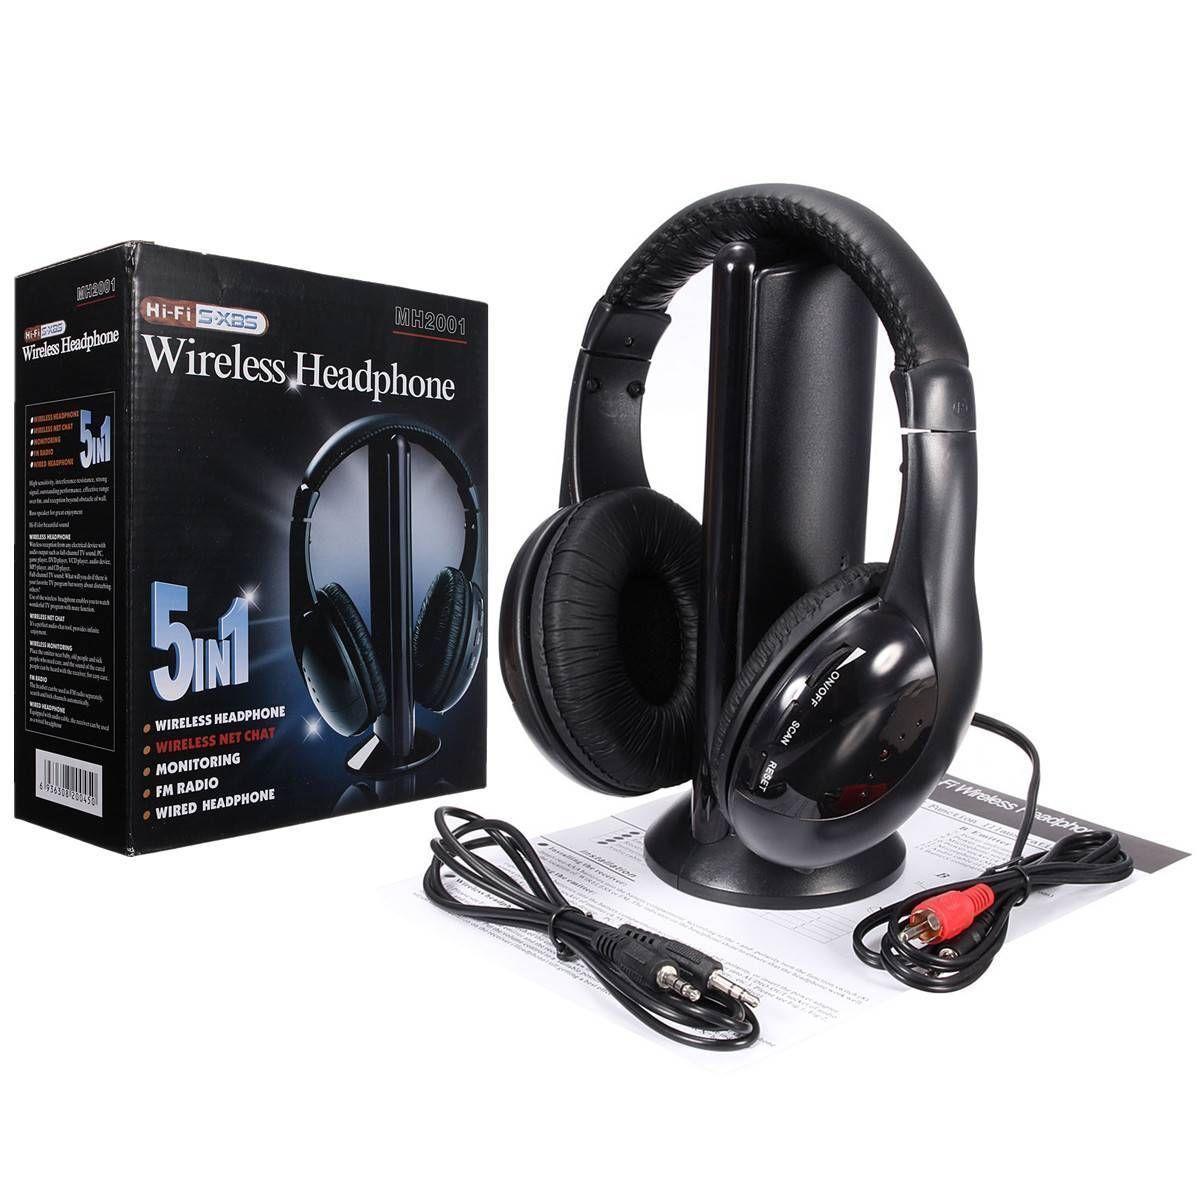 New 5 in 1 Hi-Fi Wireless Headset Headphone Earphone for TV DVD MP3 PC Black Consumer Electronics